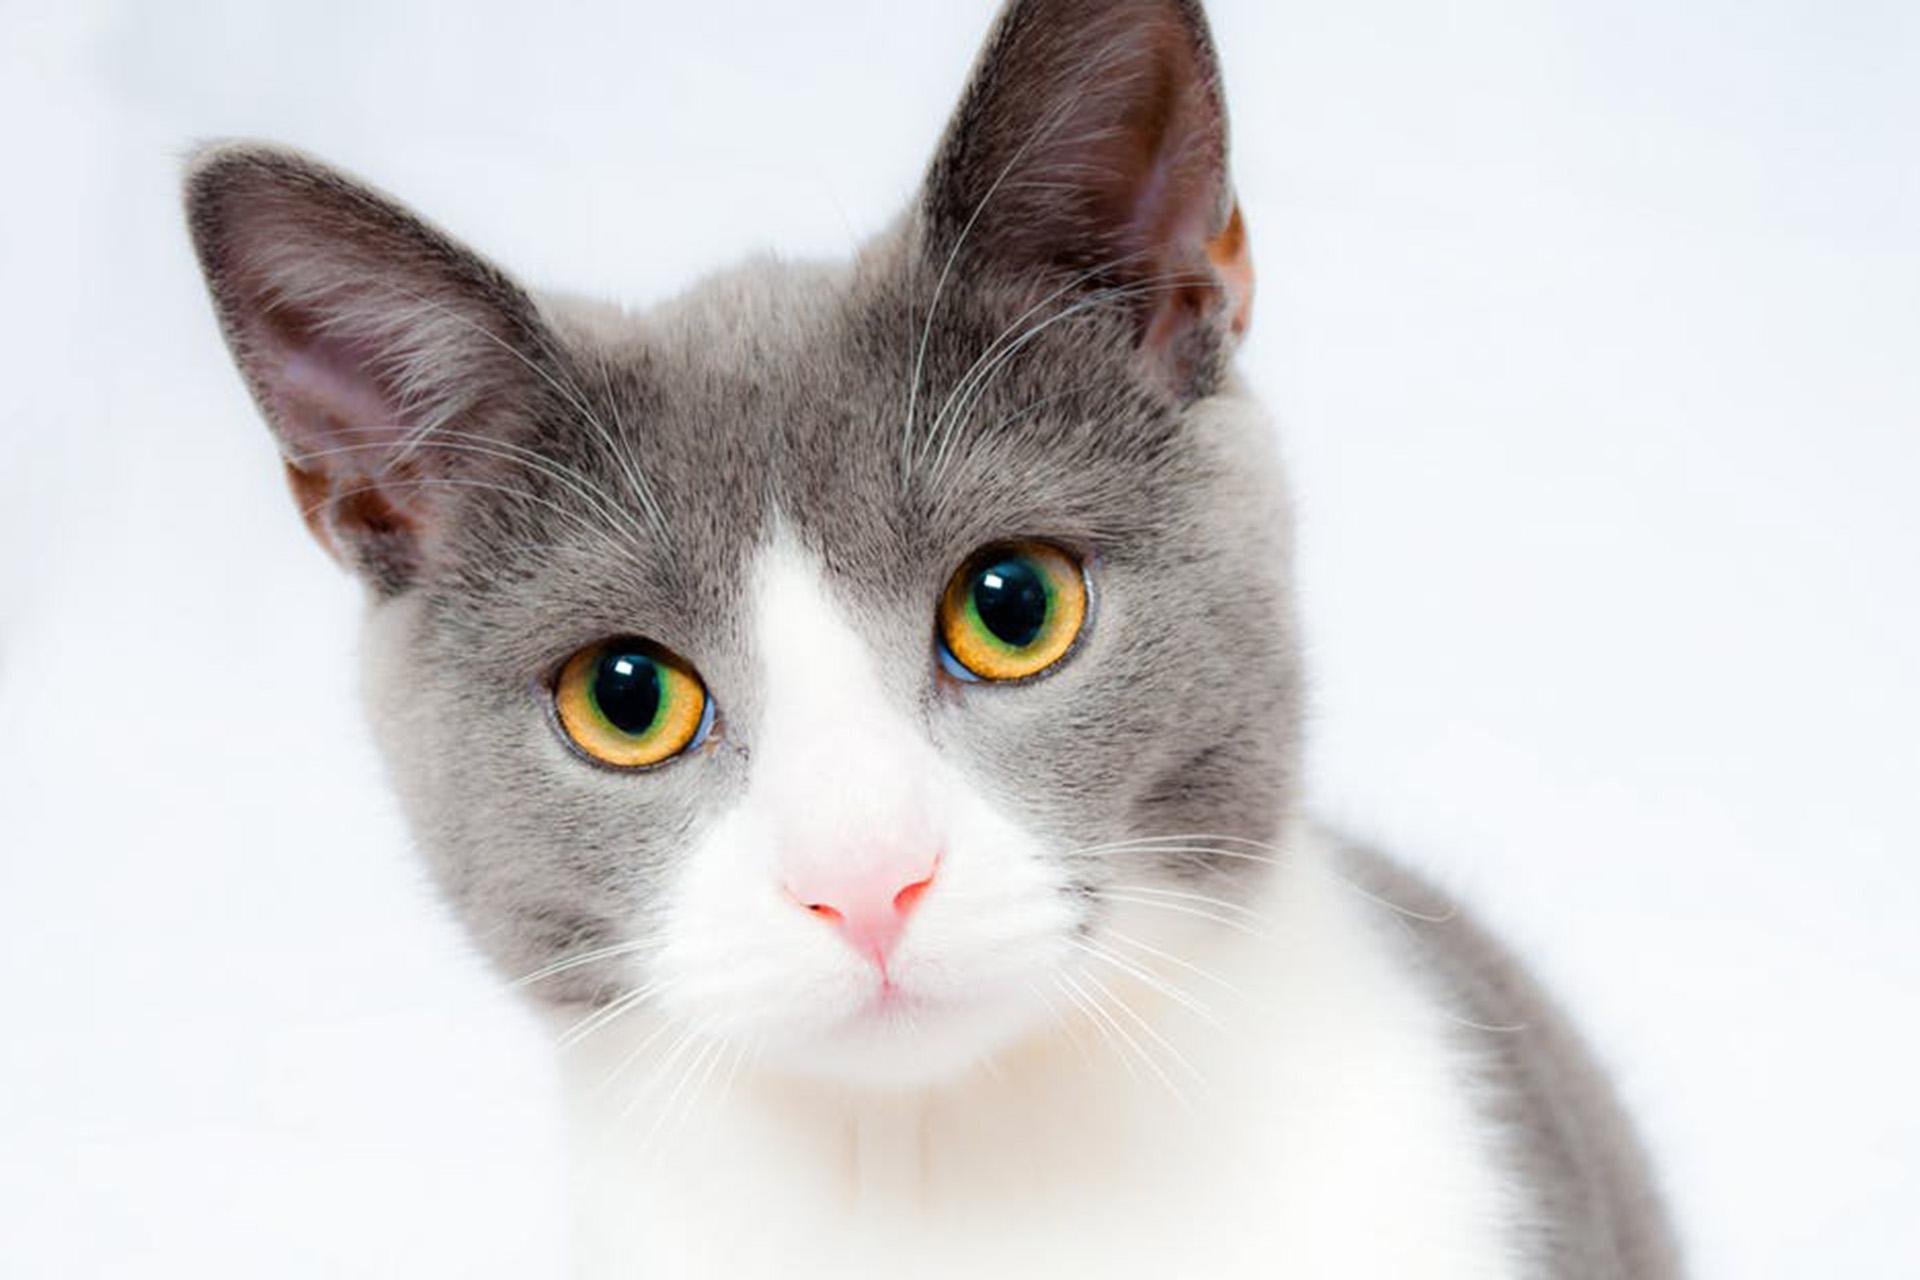 cat-pet-animal-domestic-104827.jpeg